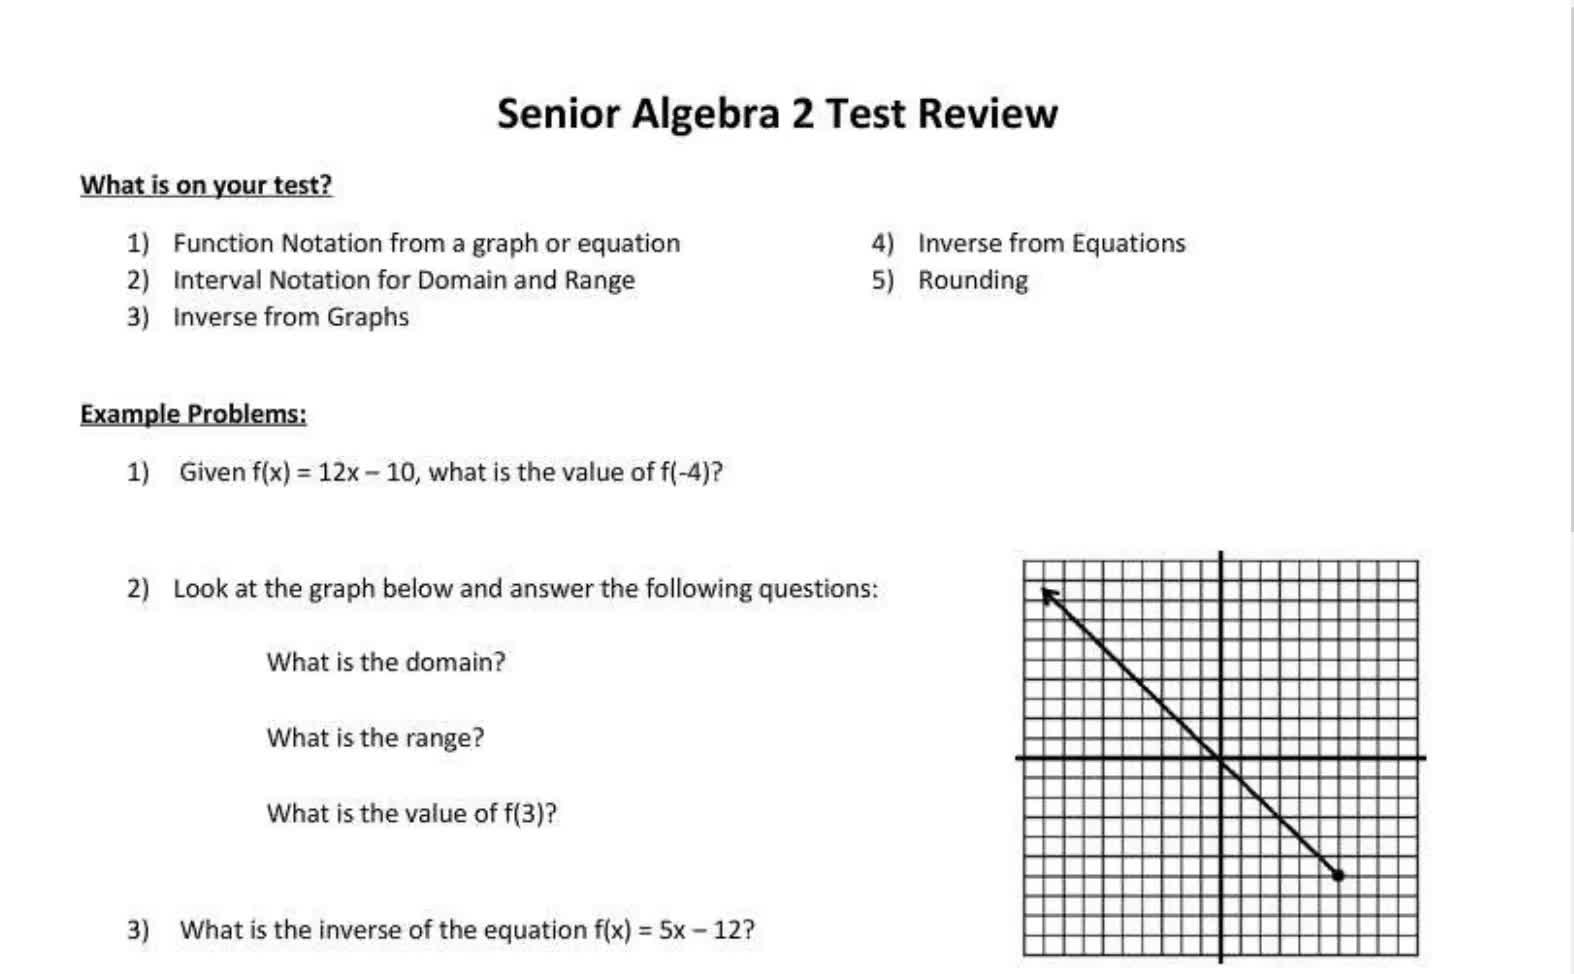 Senior Algebra 2 Review Video